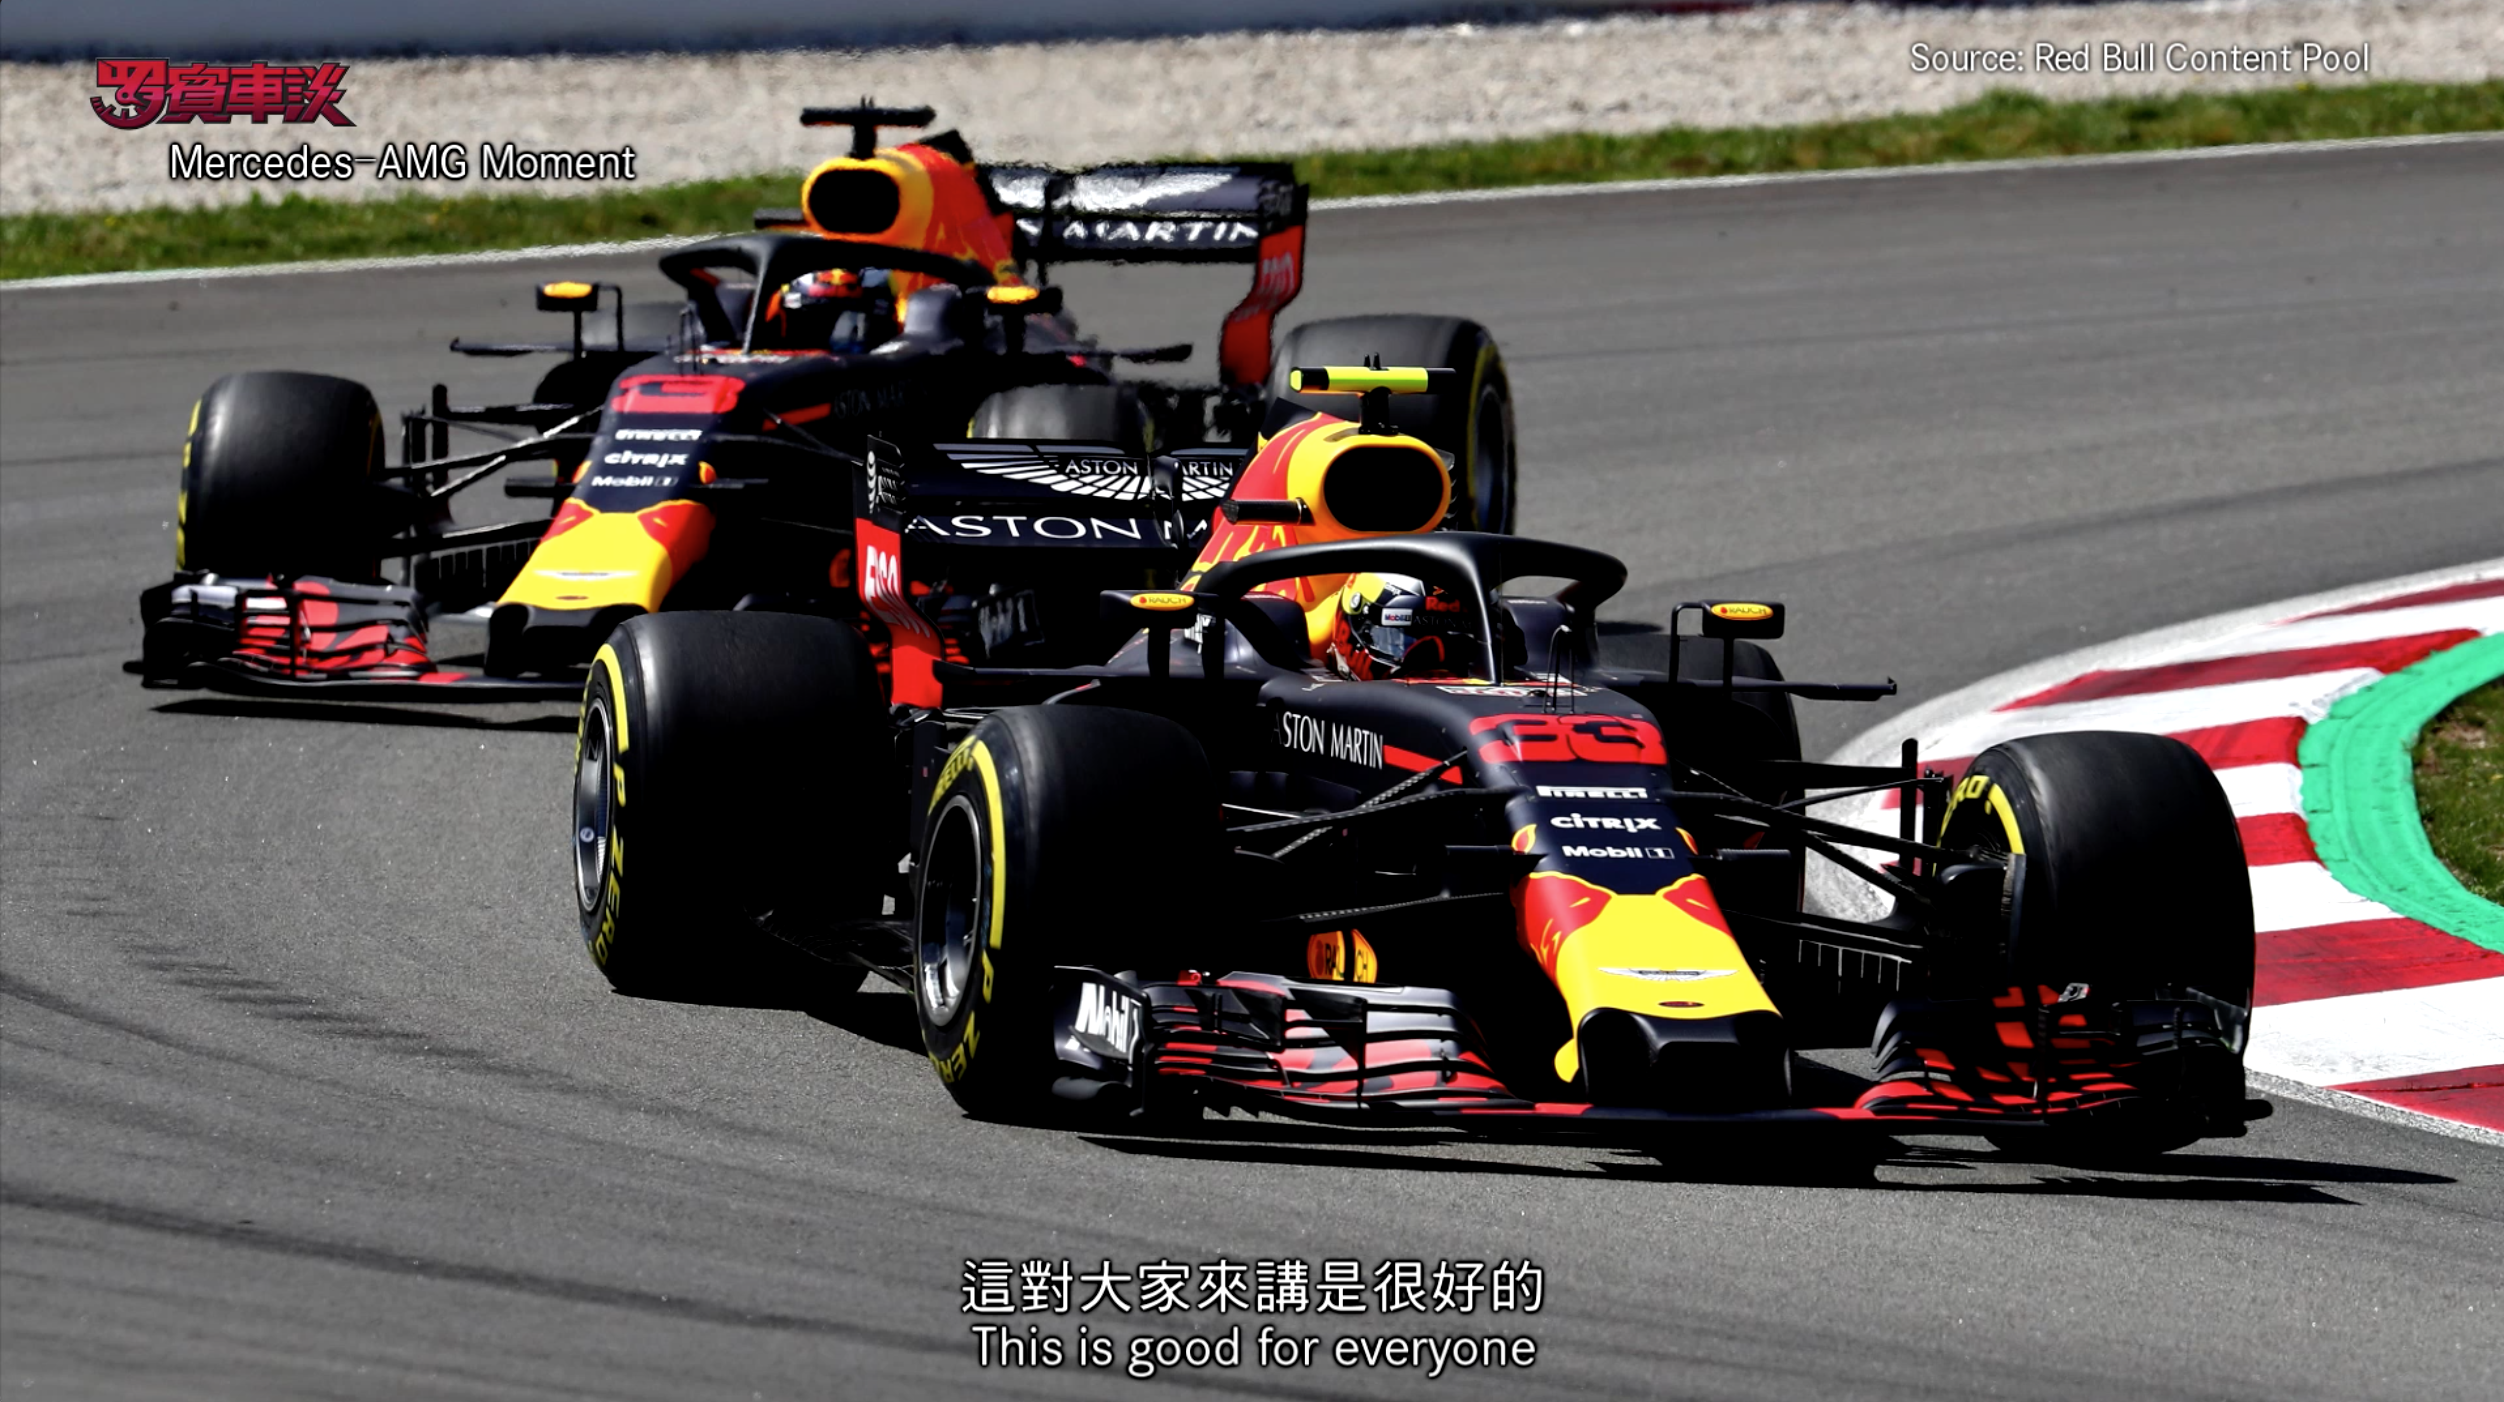 【Mercedes-AMG Moment】2018 F1賽季西班牙站賽後分析